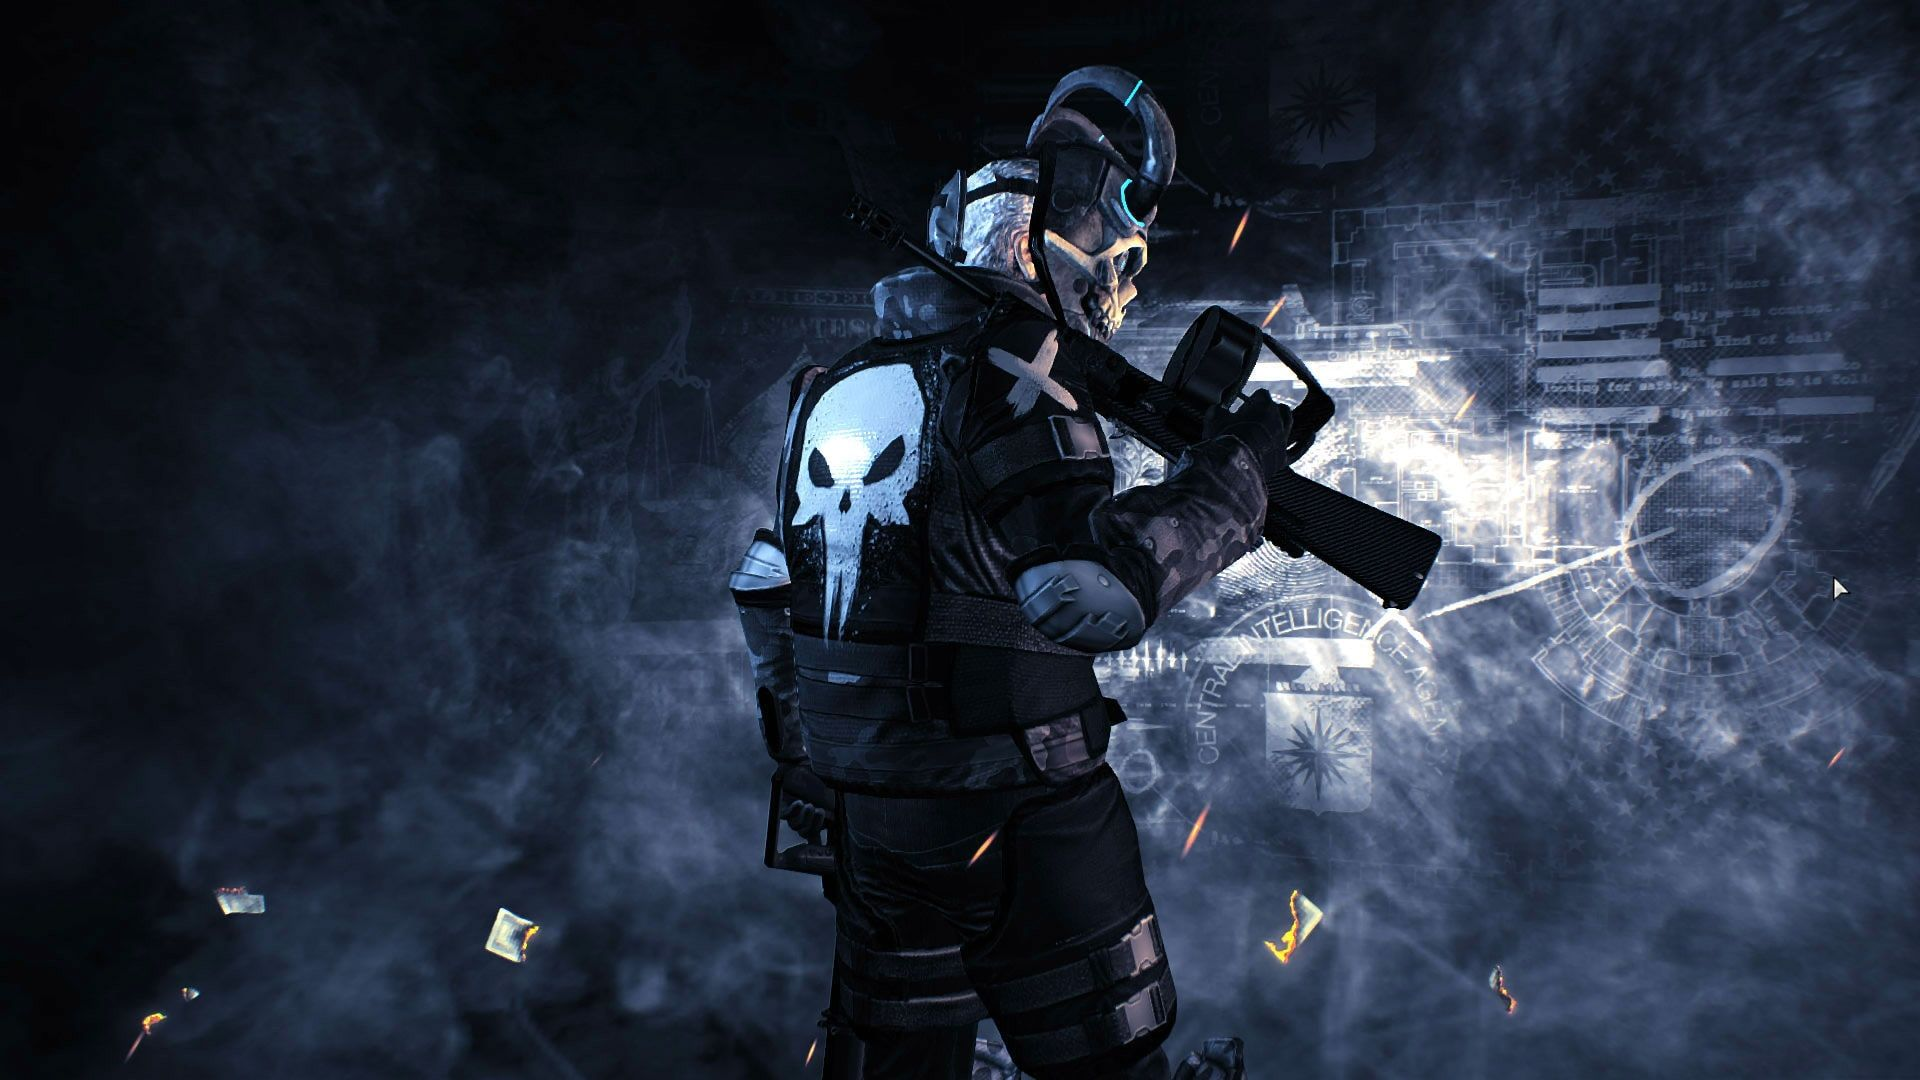 1pd2 Action Crime Fps Payday Shooter Stealth Tactical 1080p Wallpaper Hdwallpaper Desktop Cool Wallpaper Hd Wallpaper Stealth